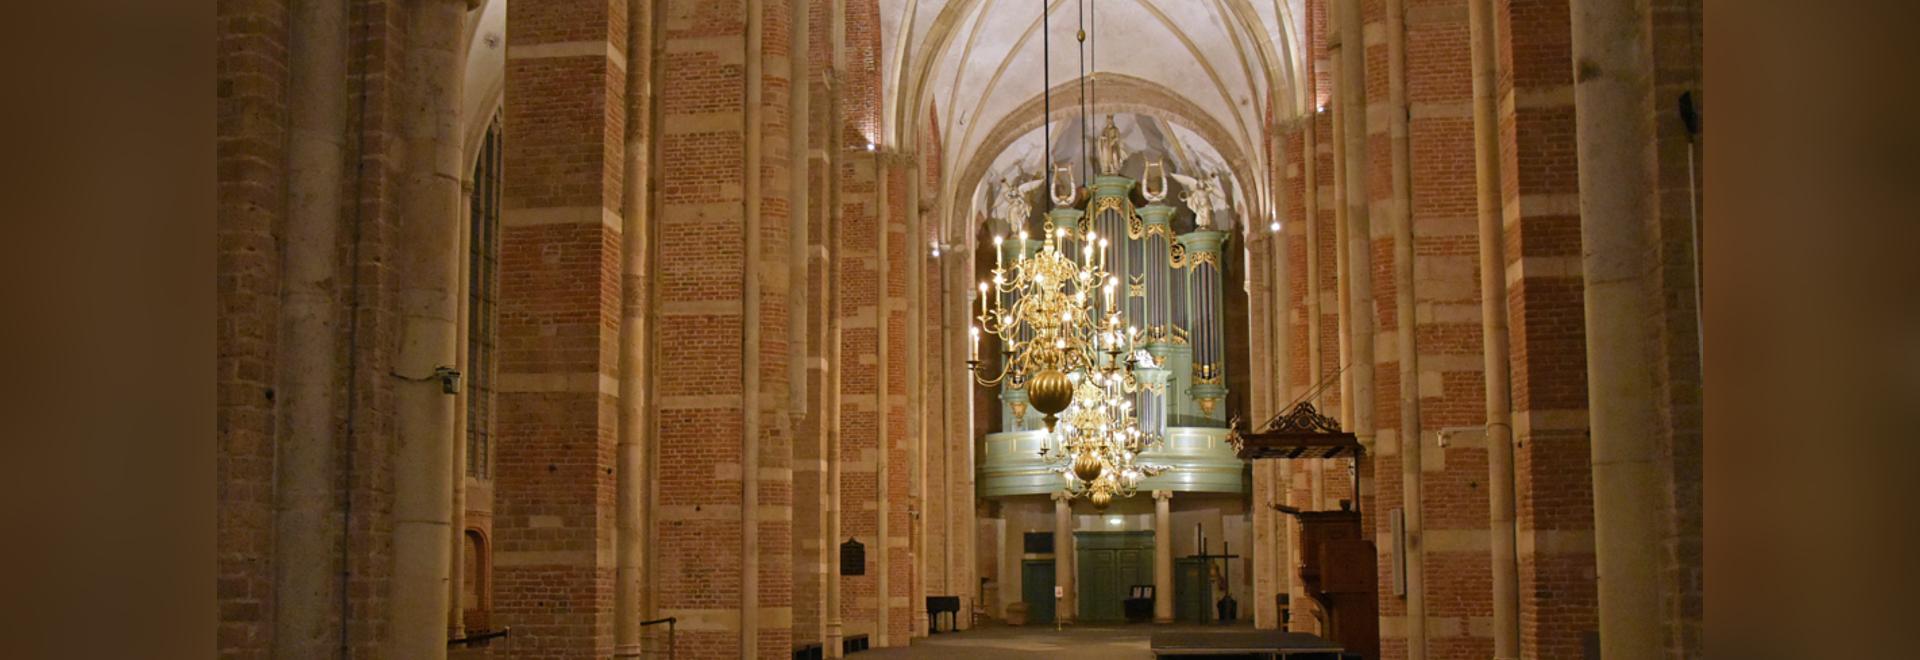 Lebuinus church, The Netherlands